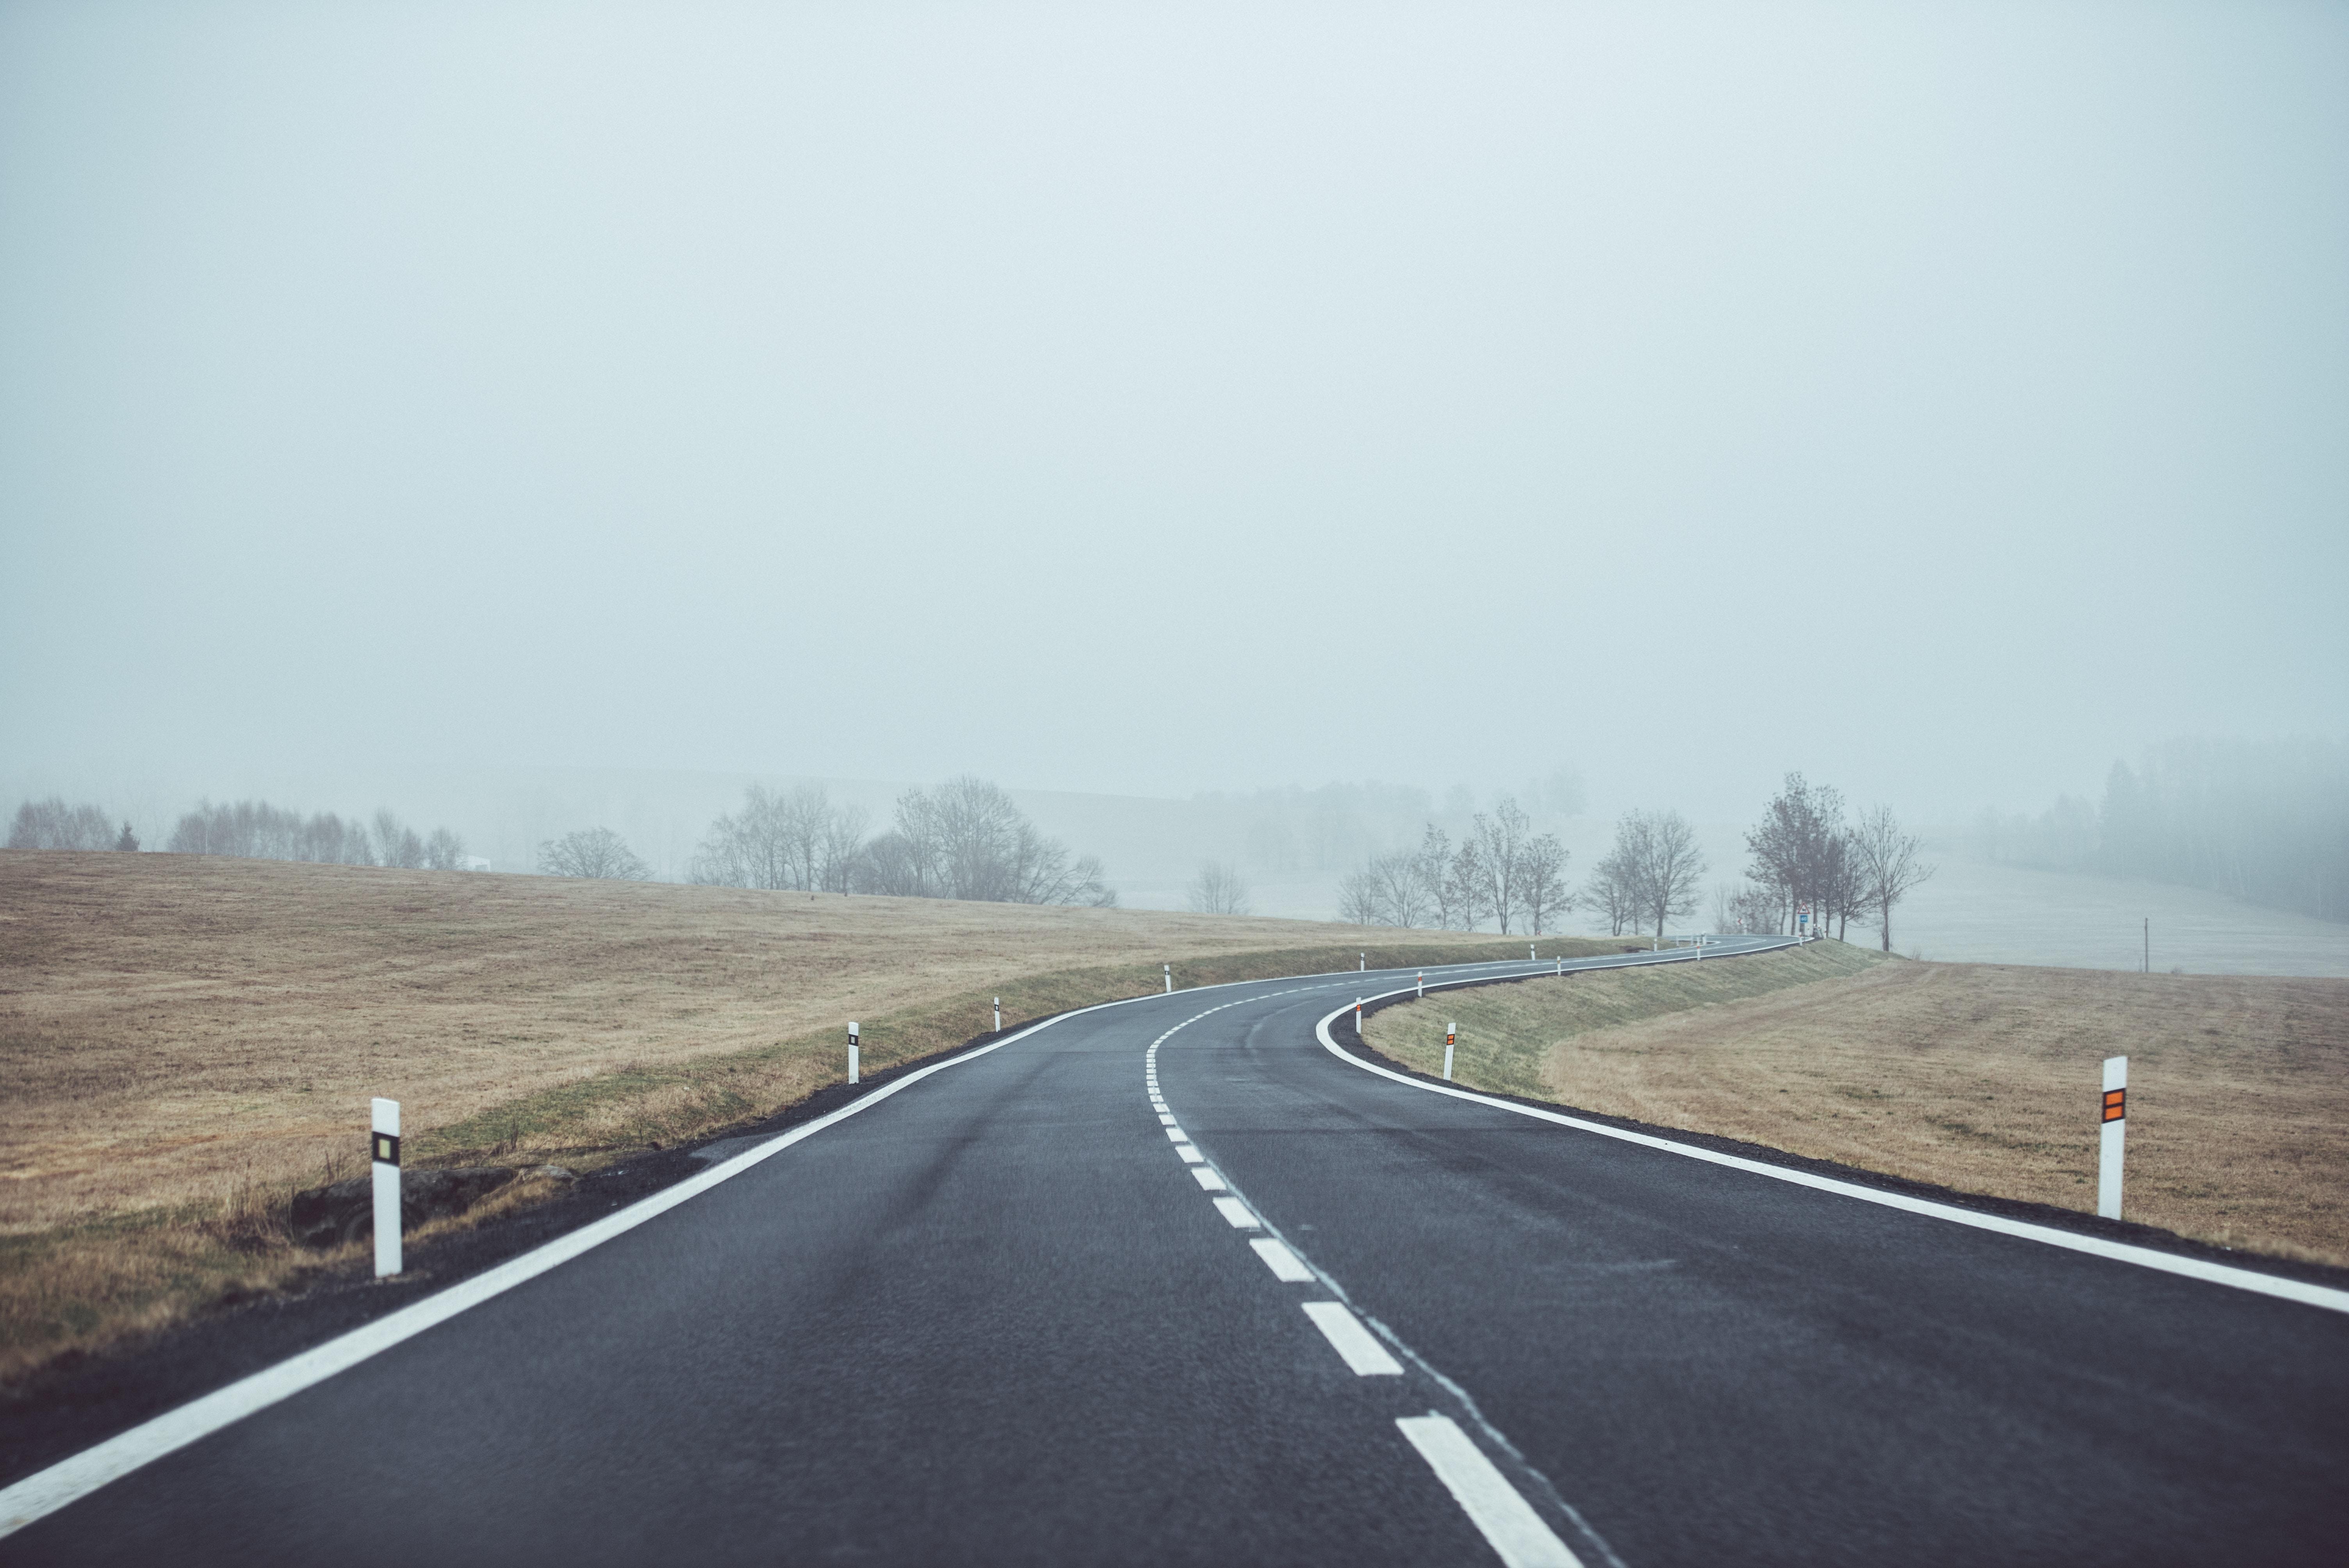 Roads curve around the fields on a foggy day in Šumava National Park